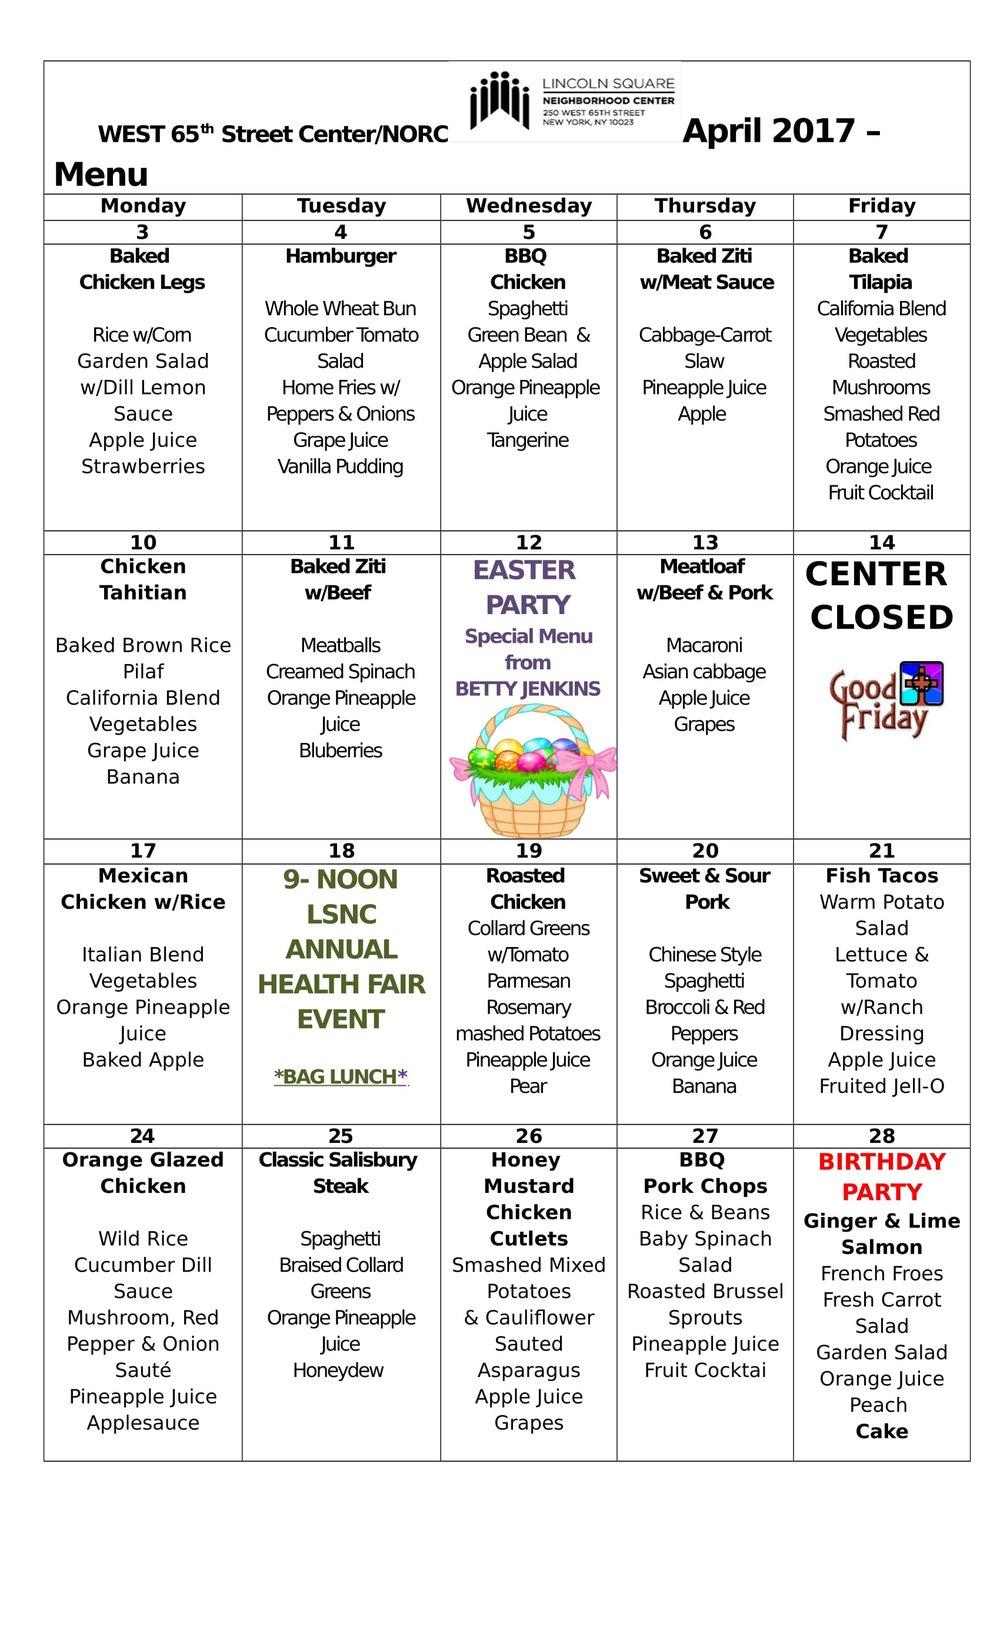 April 2017 2017 Menu Calendar-1.jpg